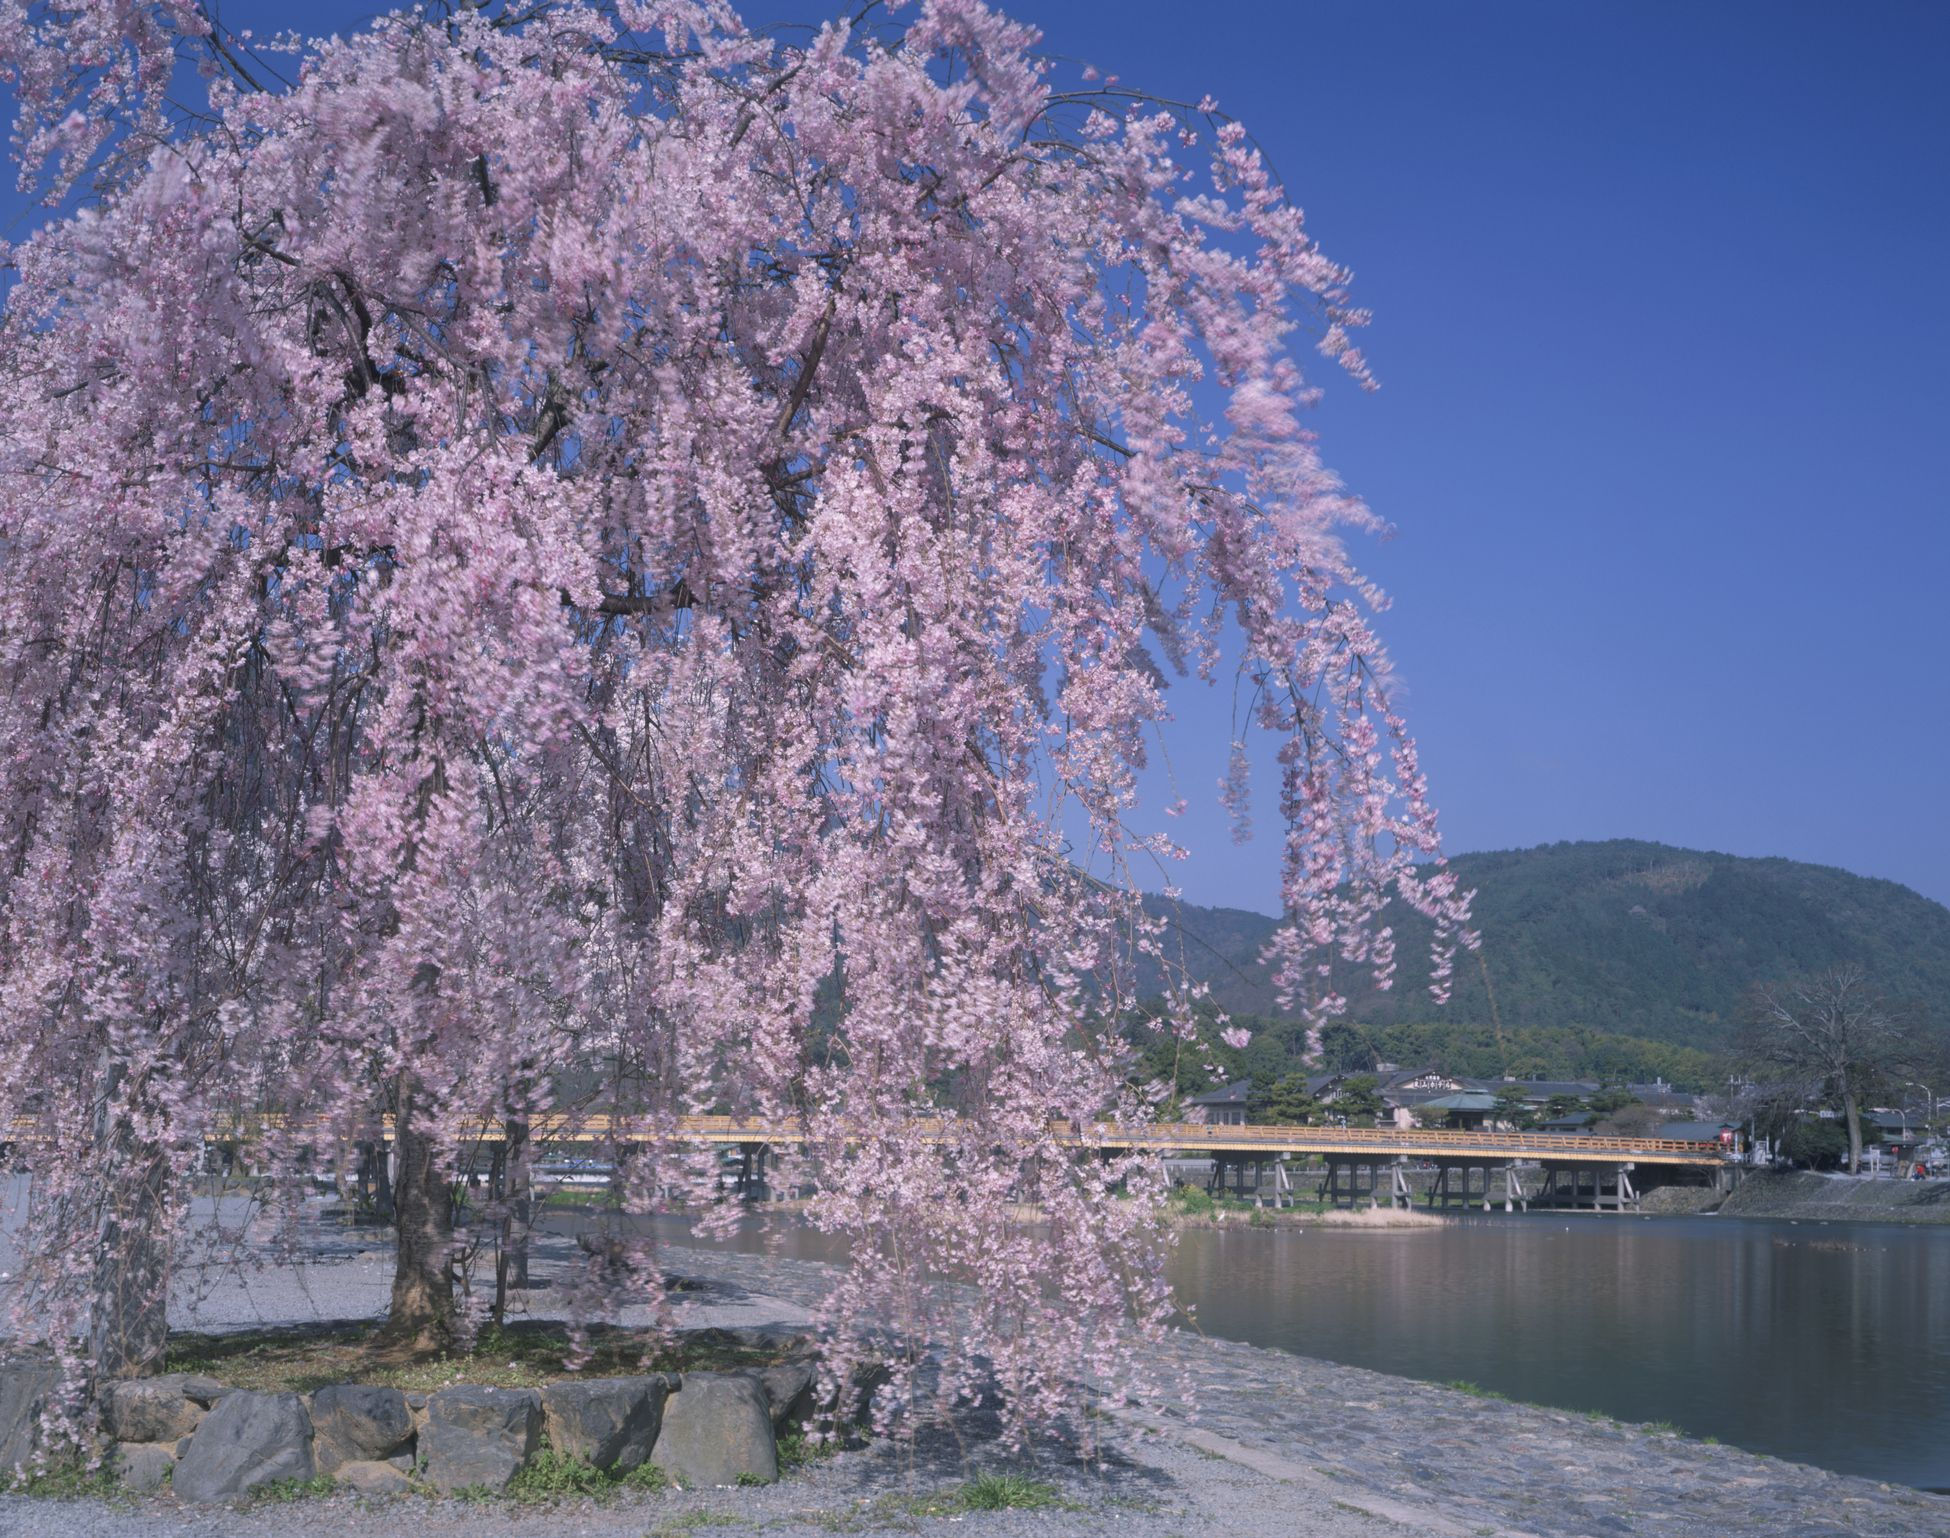 Japan, Kyoto Prefecture, Arashiyama, Oi River, Togetsukyo Bridge, Mt Ogura, Weeping Cherry tree at riverside